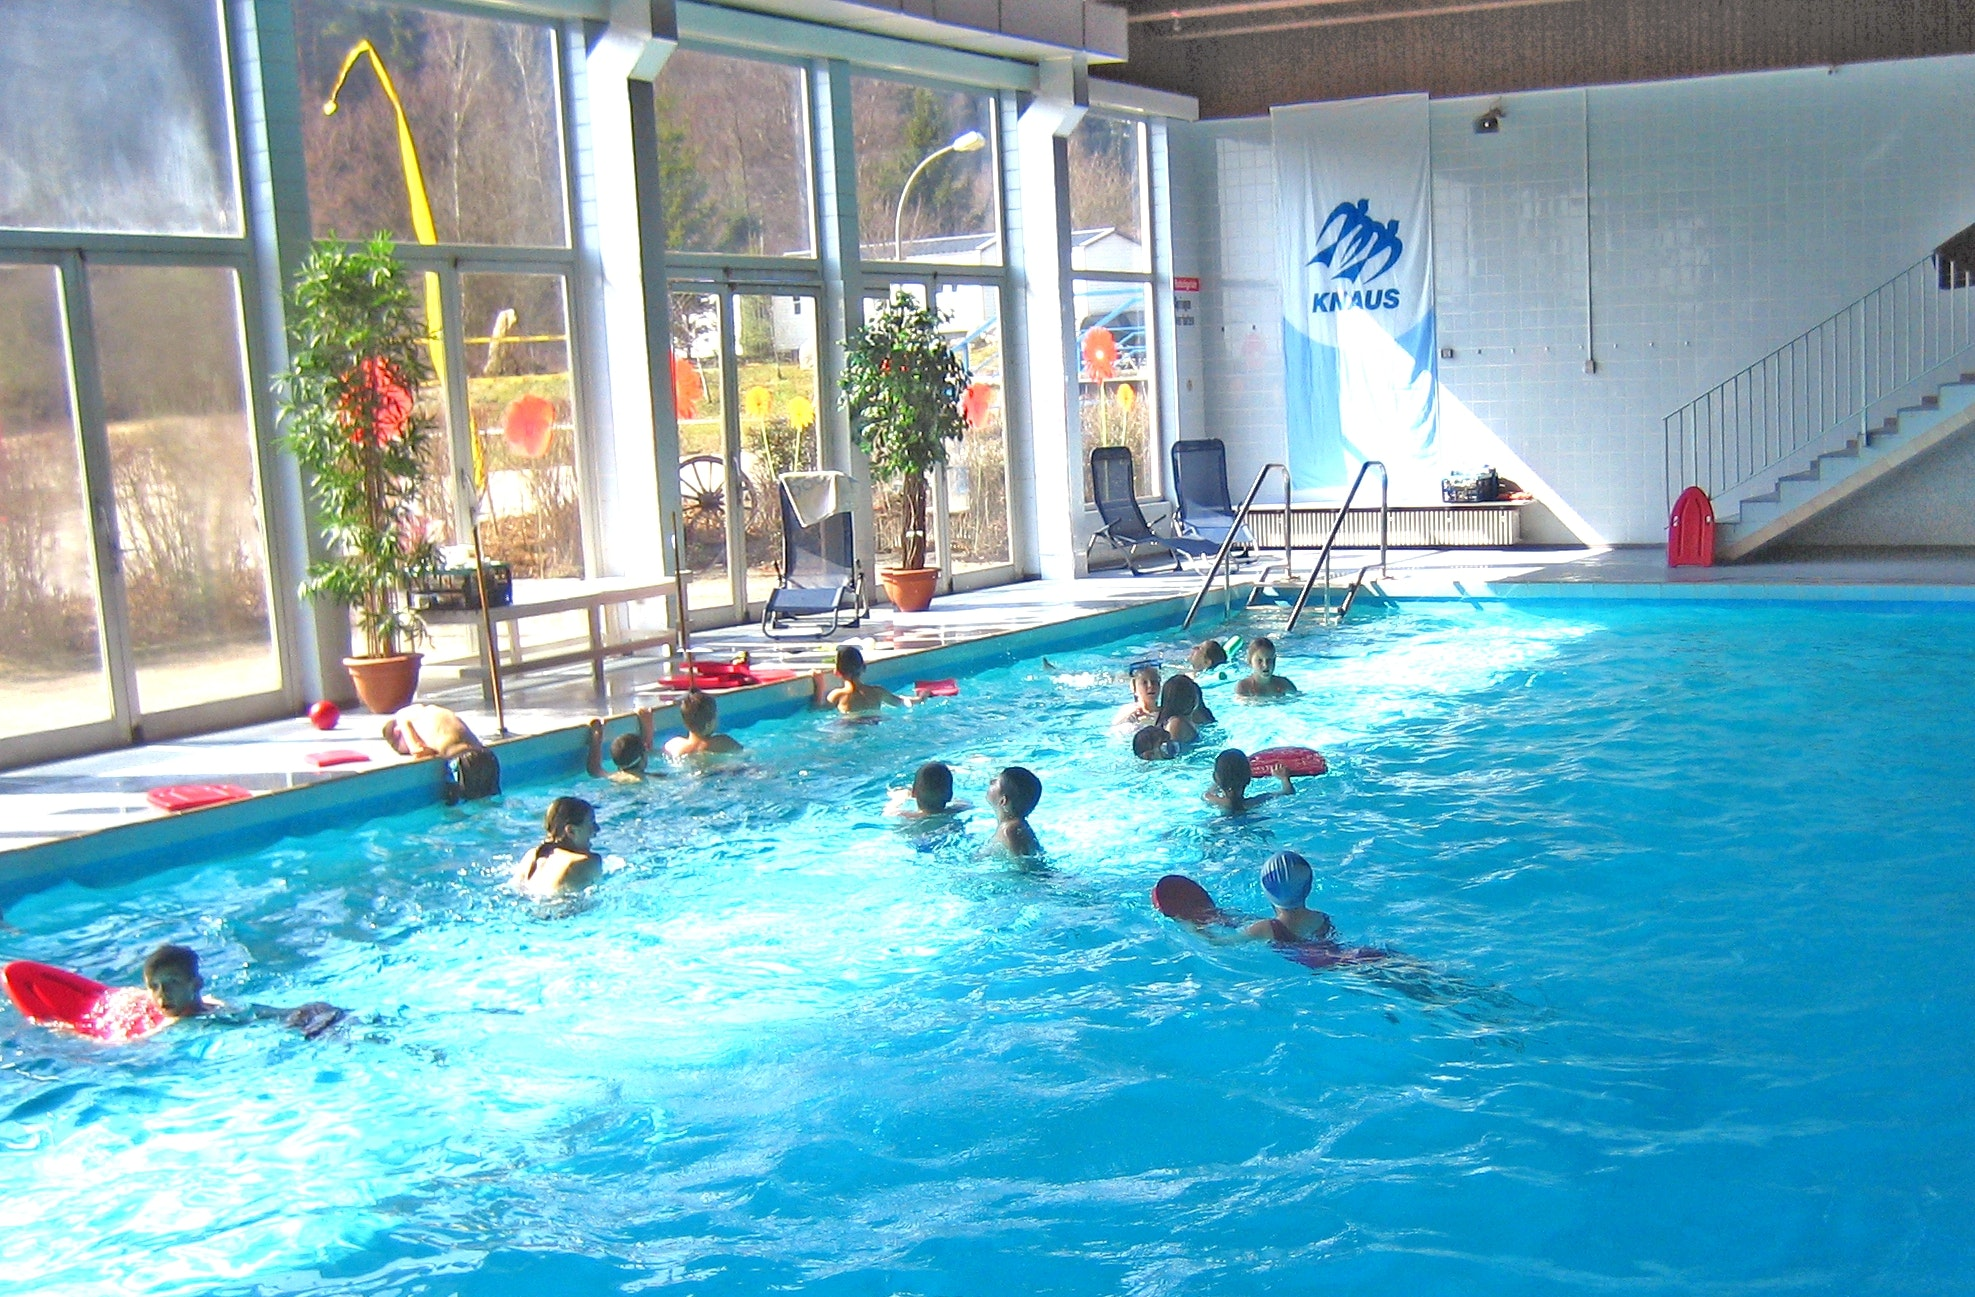 Binnenzwembad Knaus Viechtach